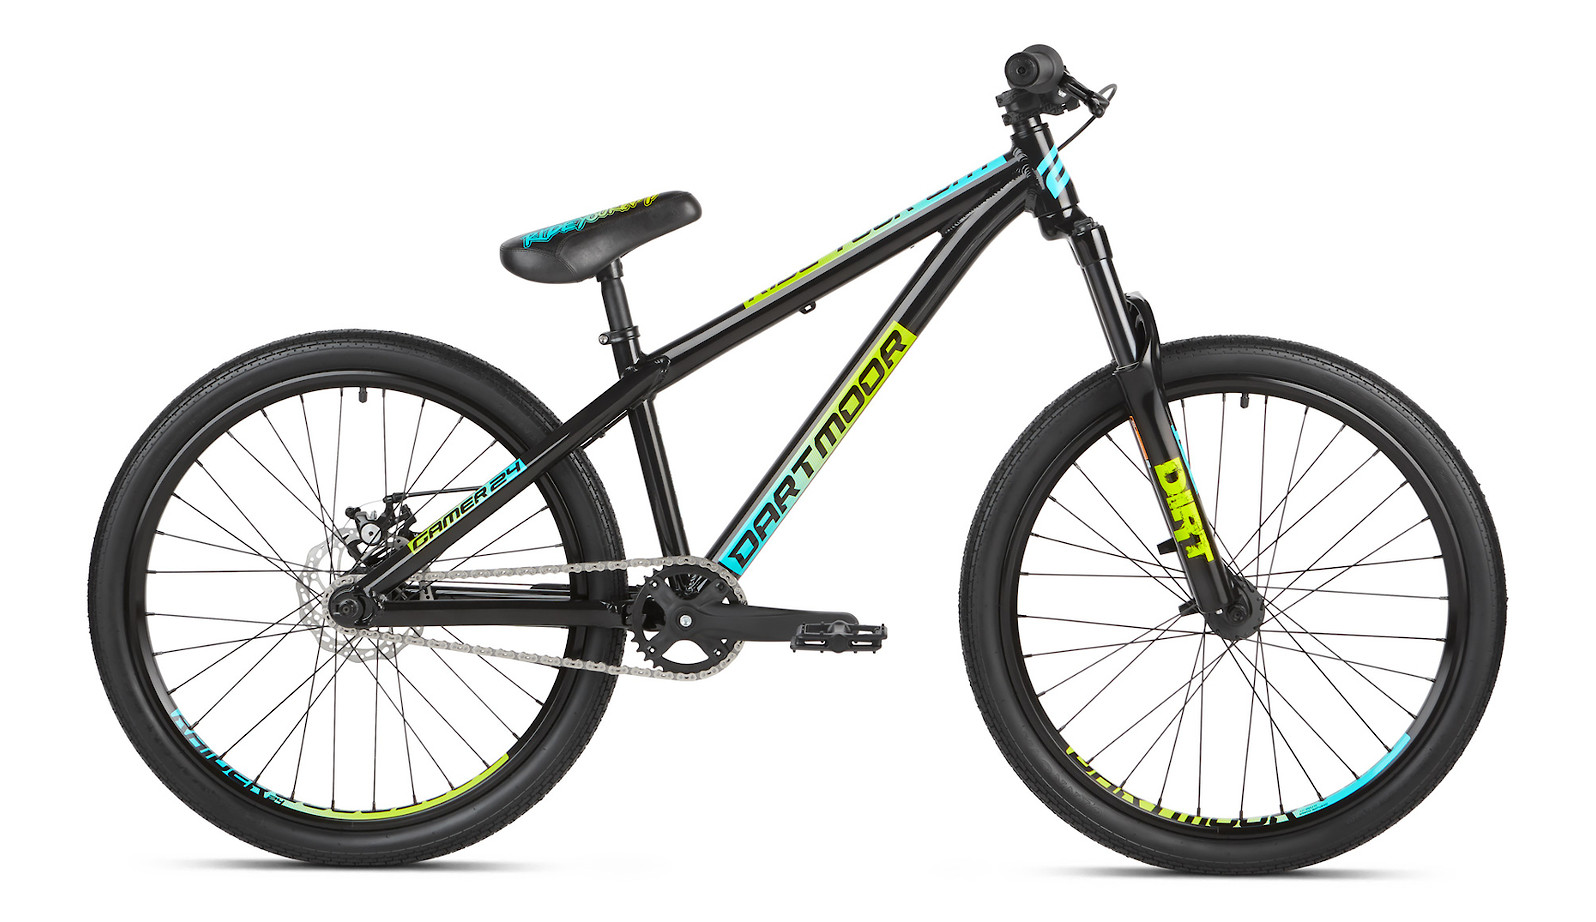 2019 Dartmoor Gamer Intro 24 Bike